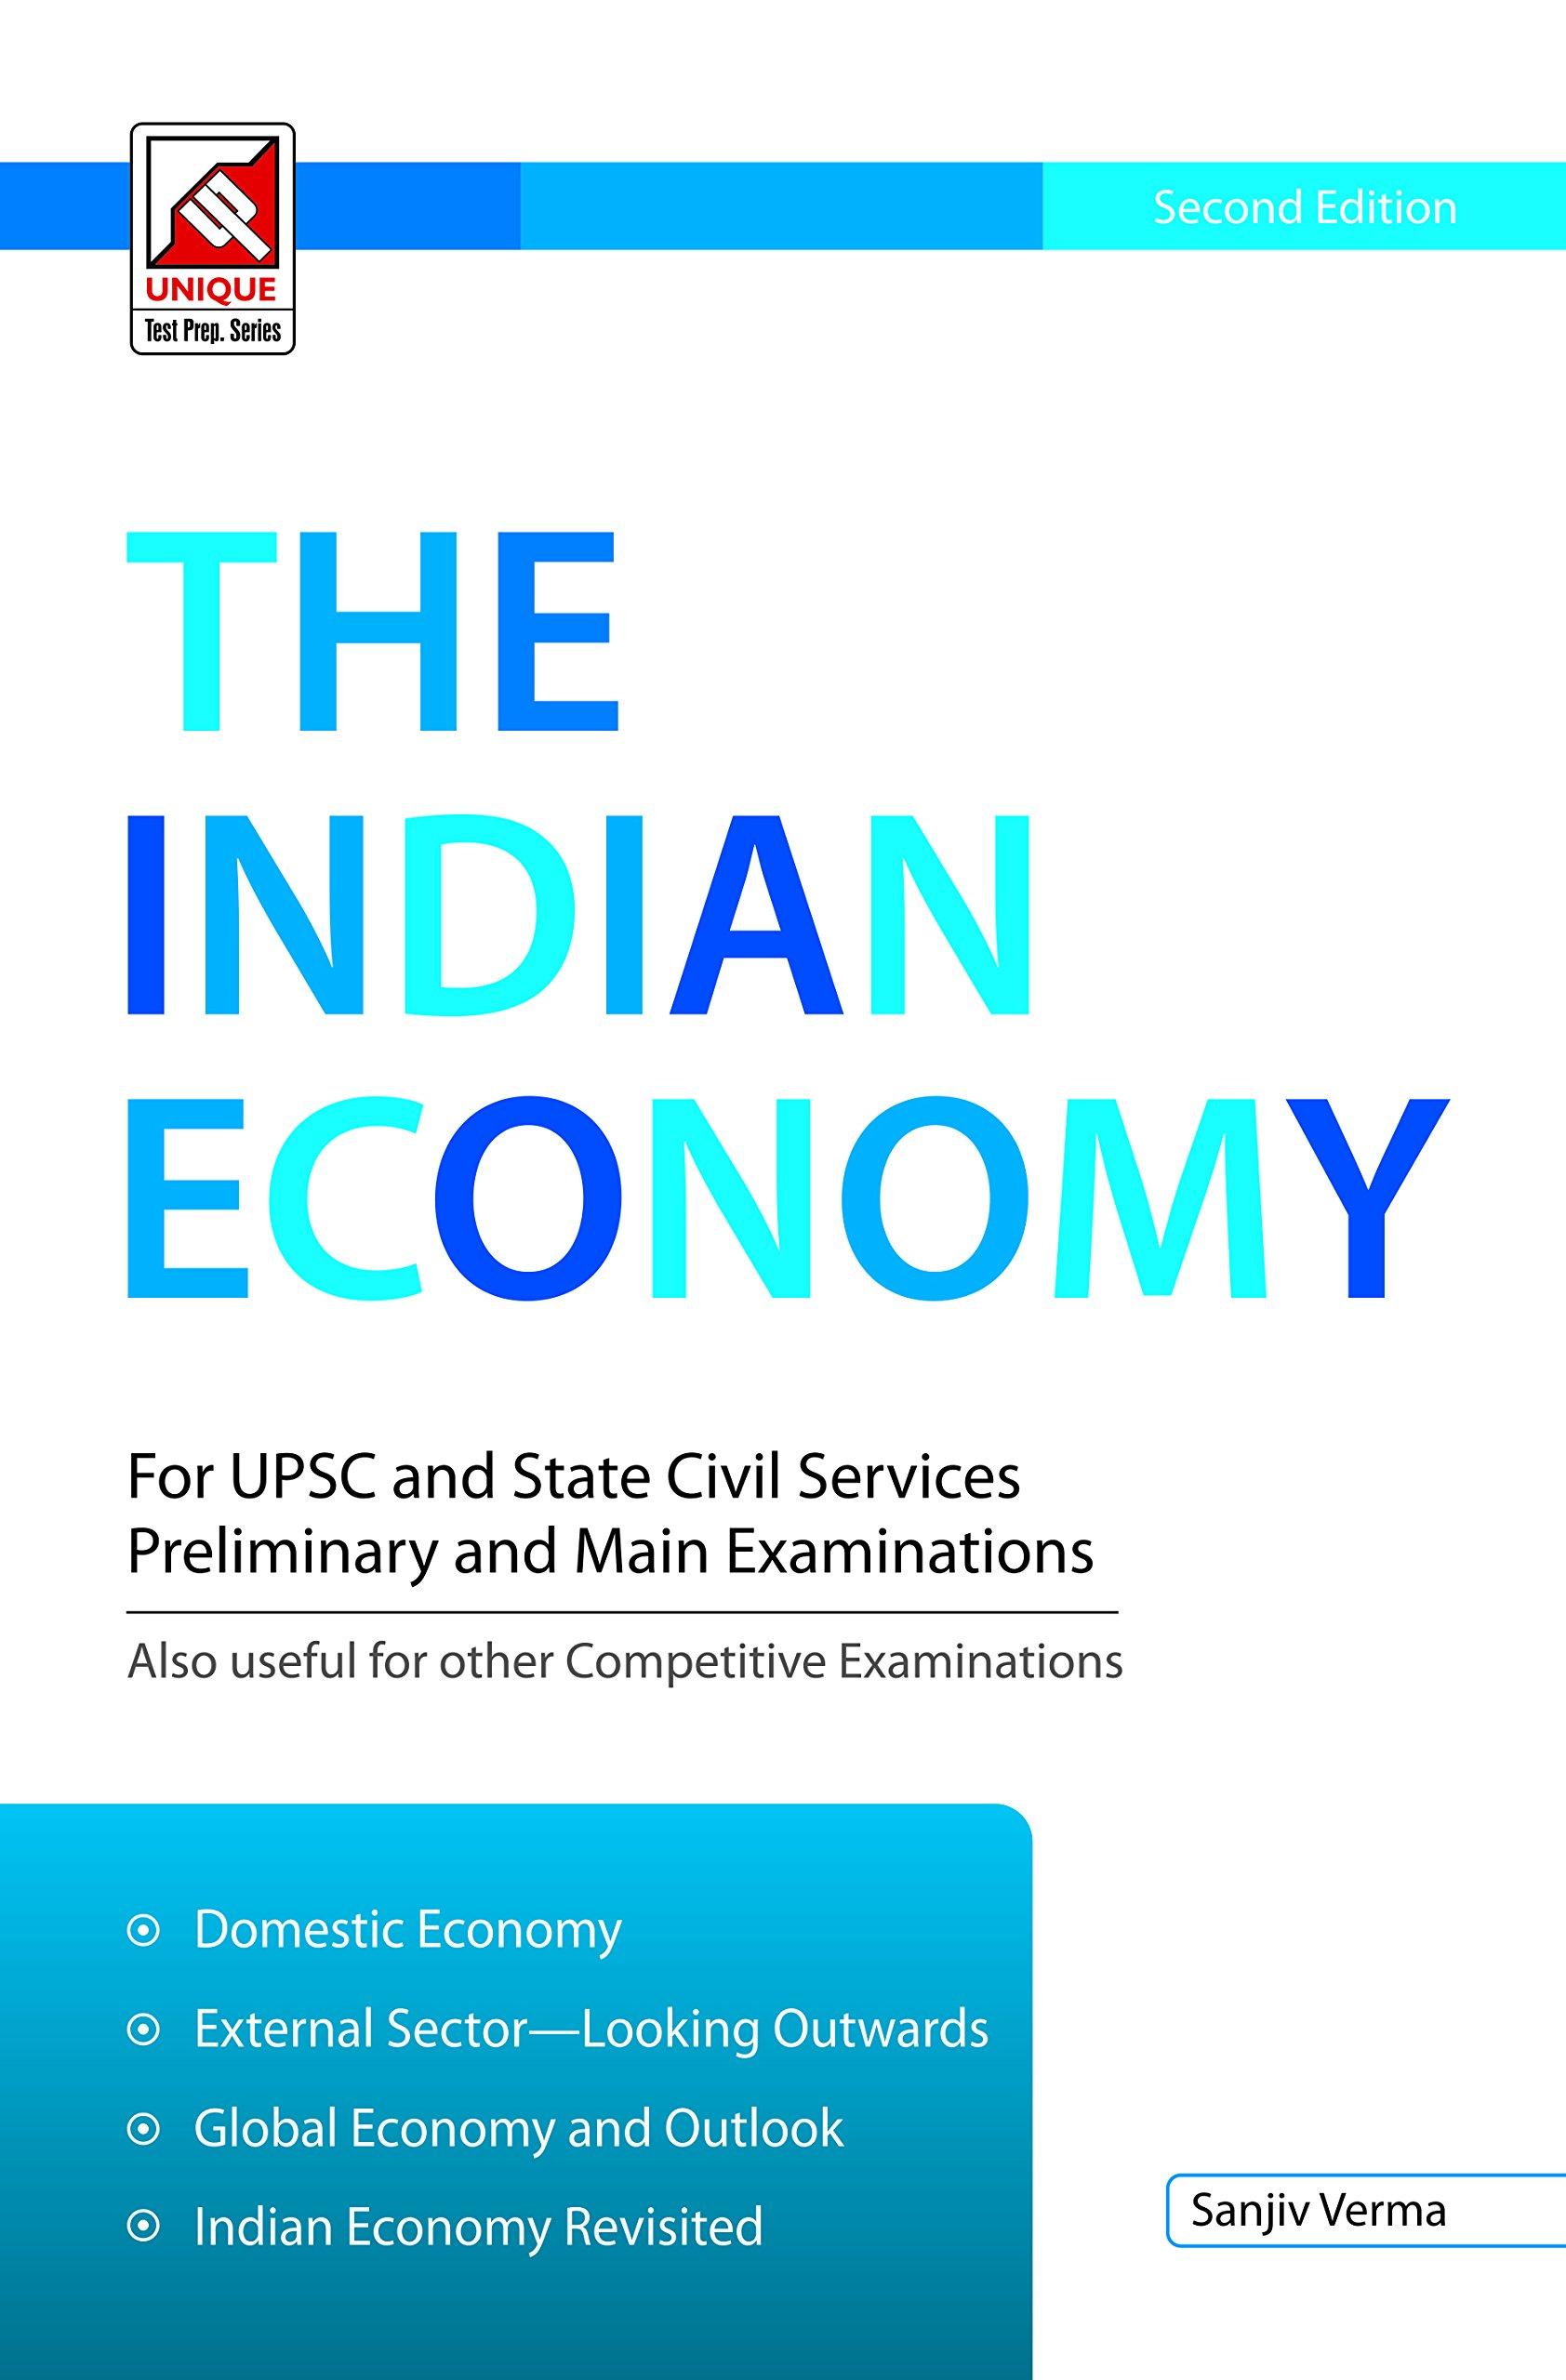 Indian Economy Book By Dutt & Sundaram